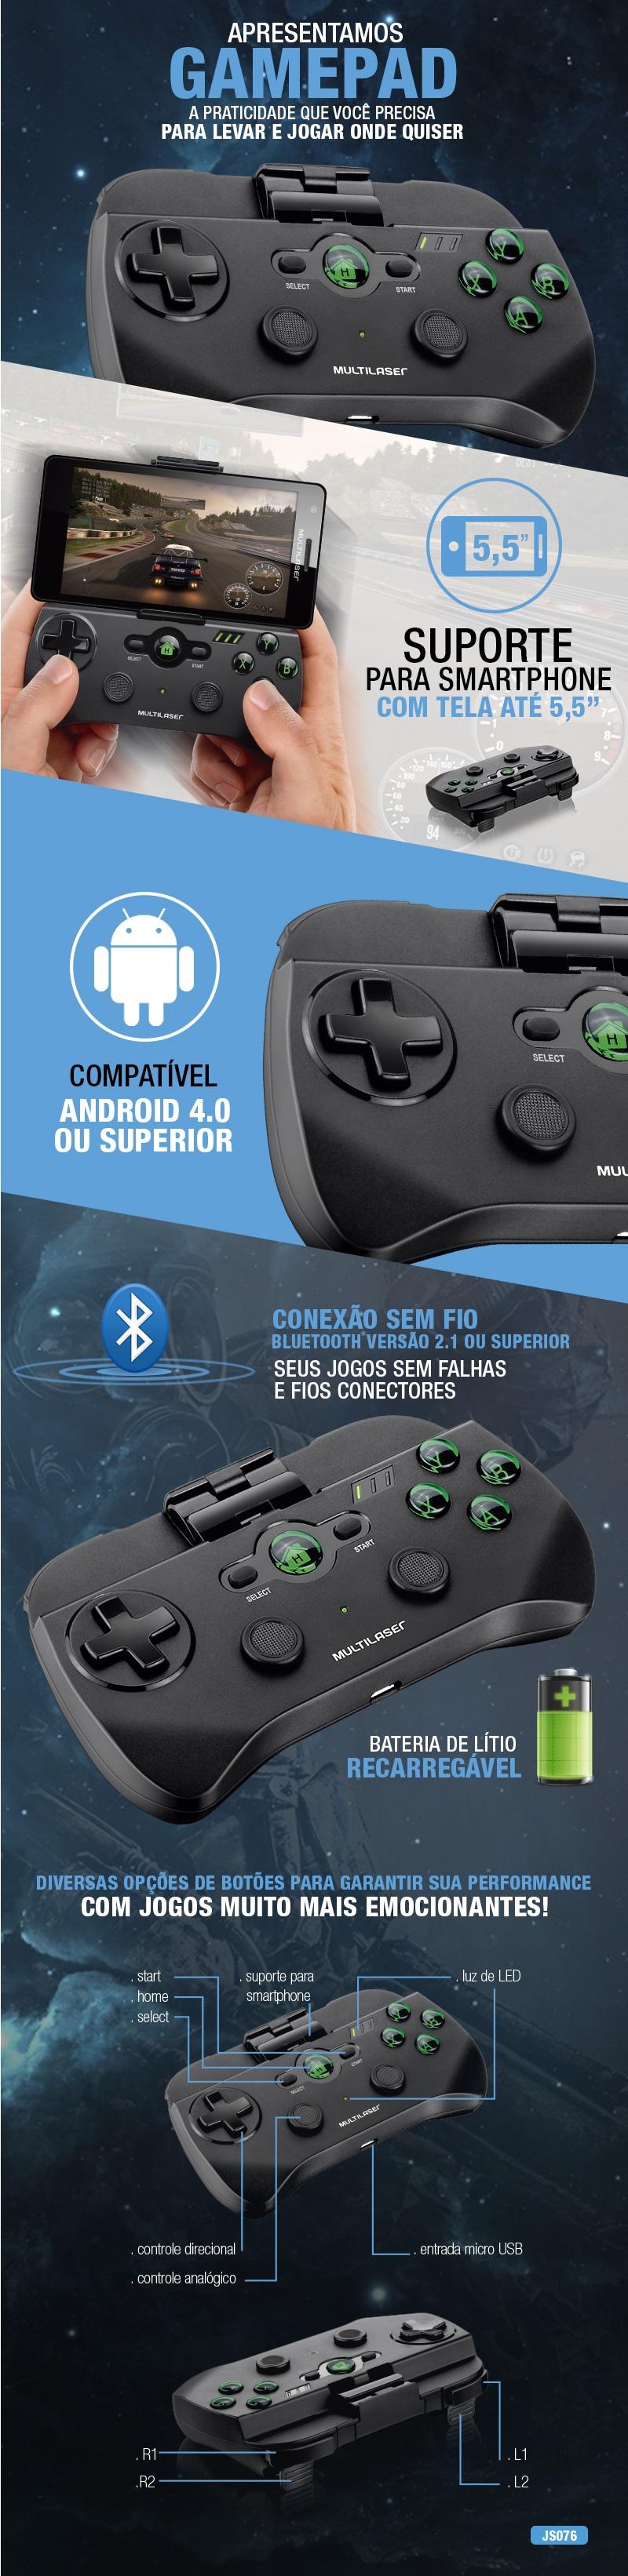 Controle Sem Fio Multilaser para Jogos de Smartphone